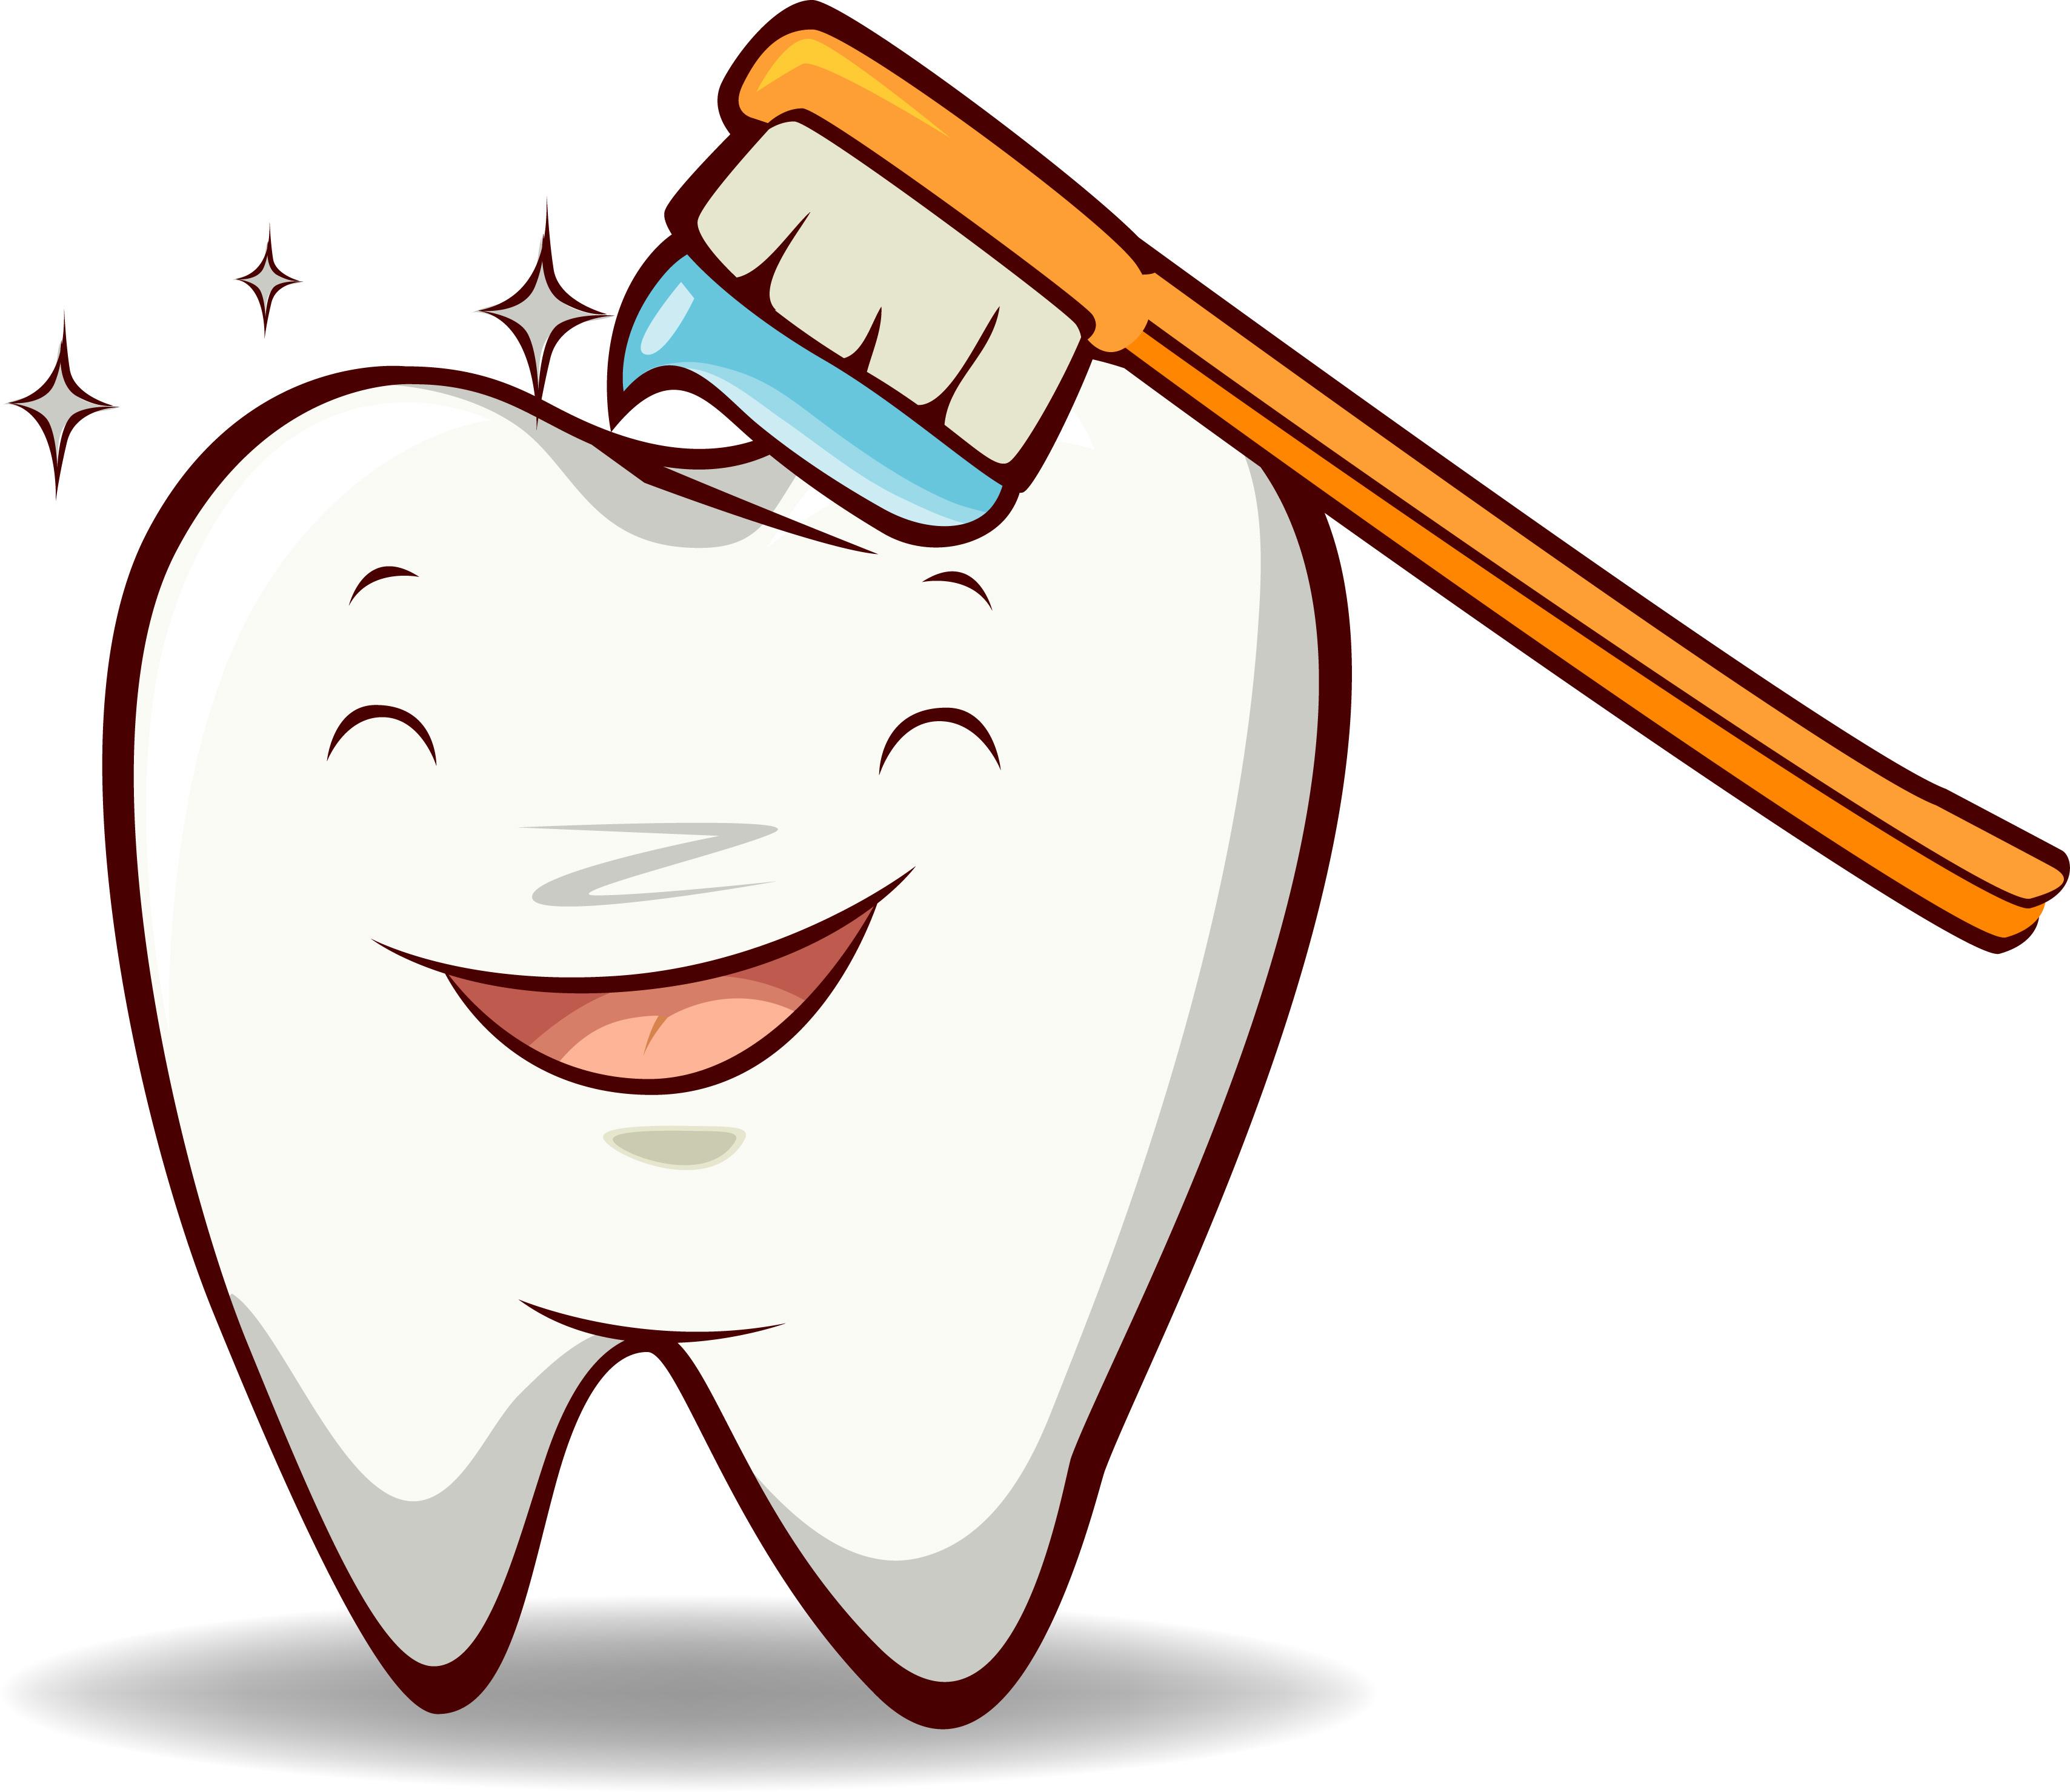 Clip Art Dentist Clip Art funny dentist clipart kid black and white dental 4tb4zp8tg jpeg